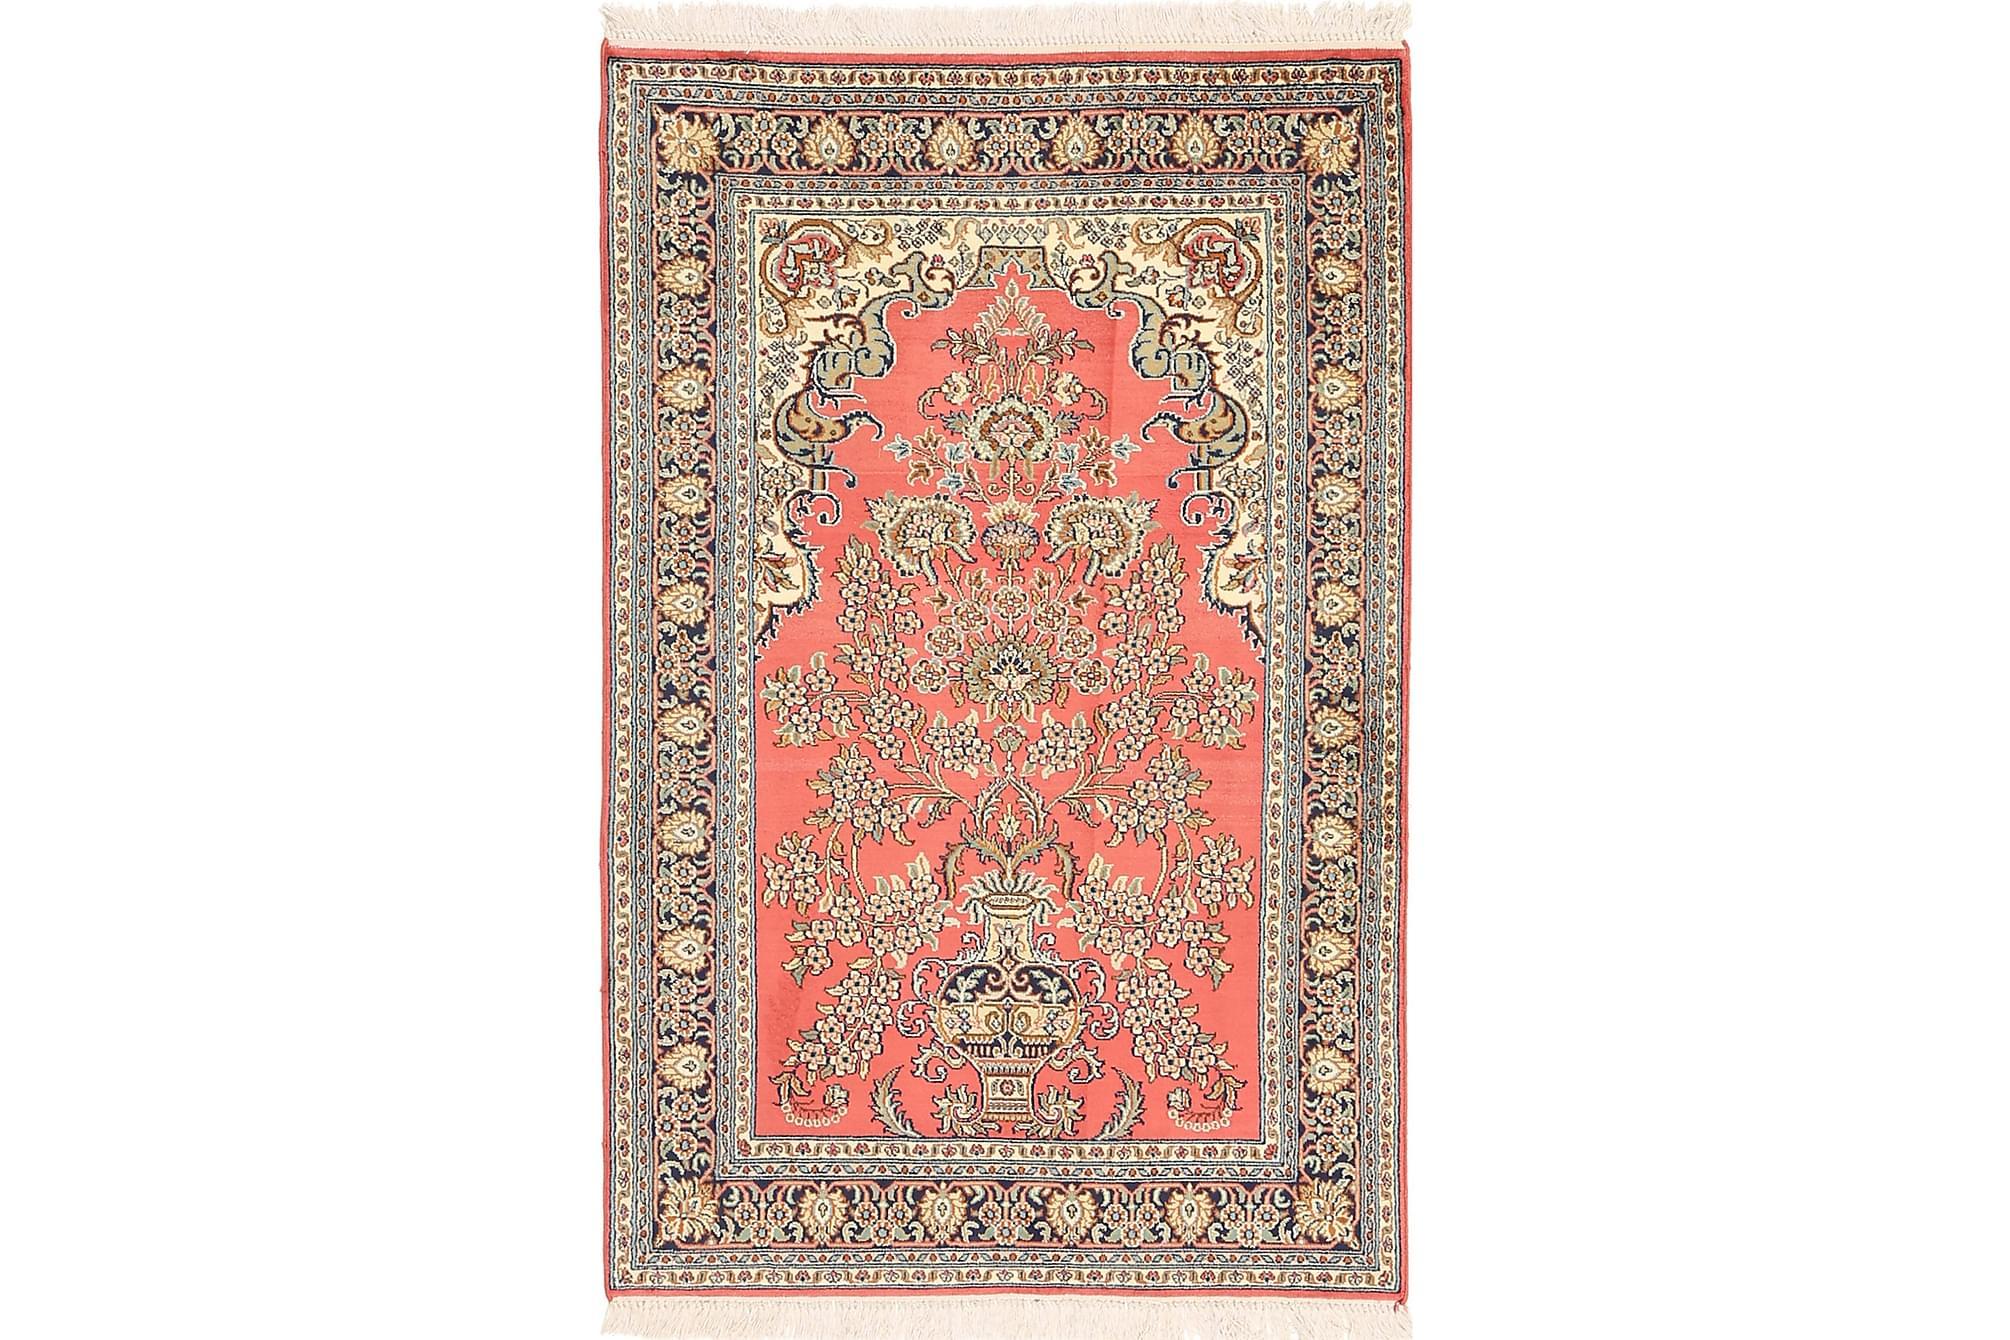 ORIENTALISK Silkesmatta Kashmir 78x121, Äkta silkesmattor